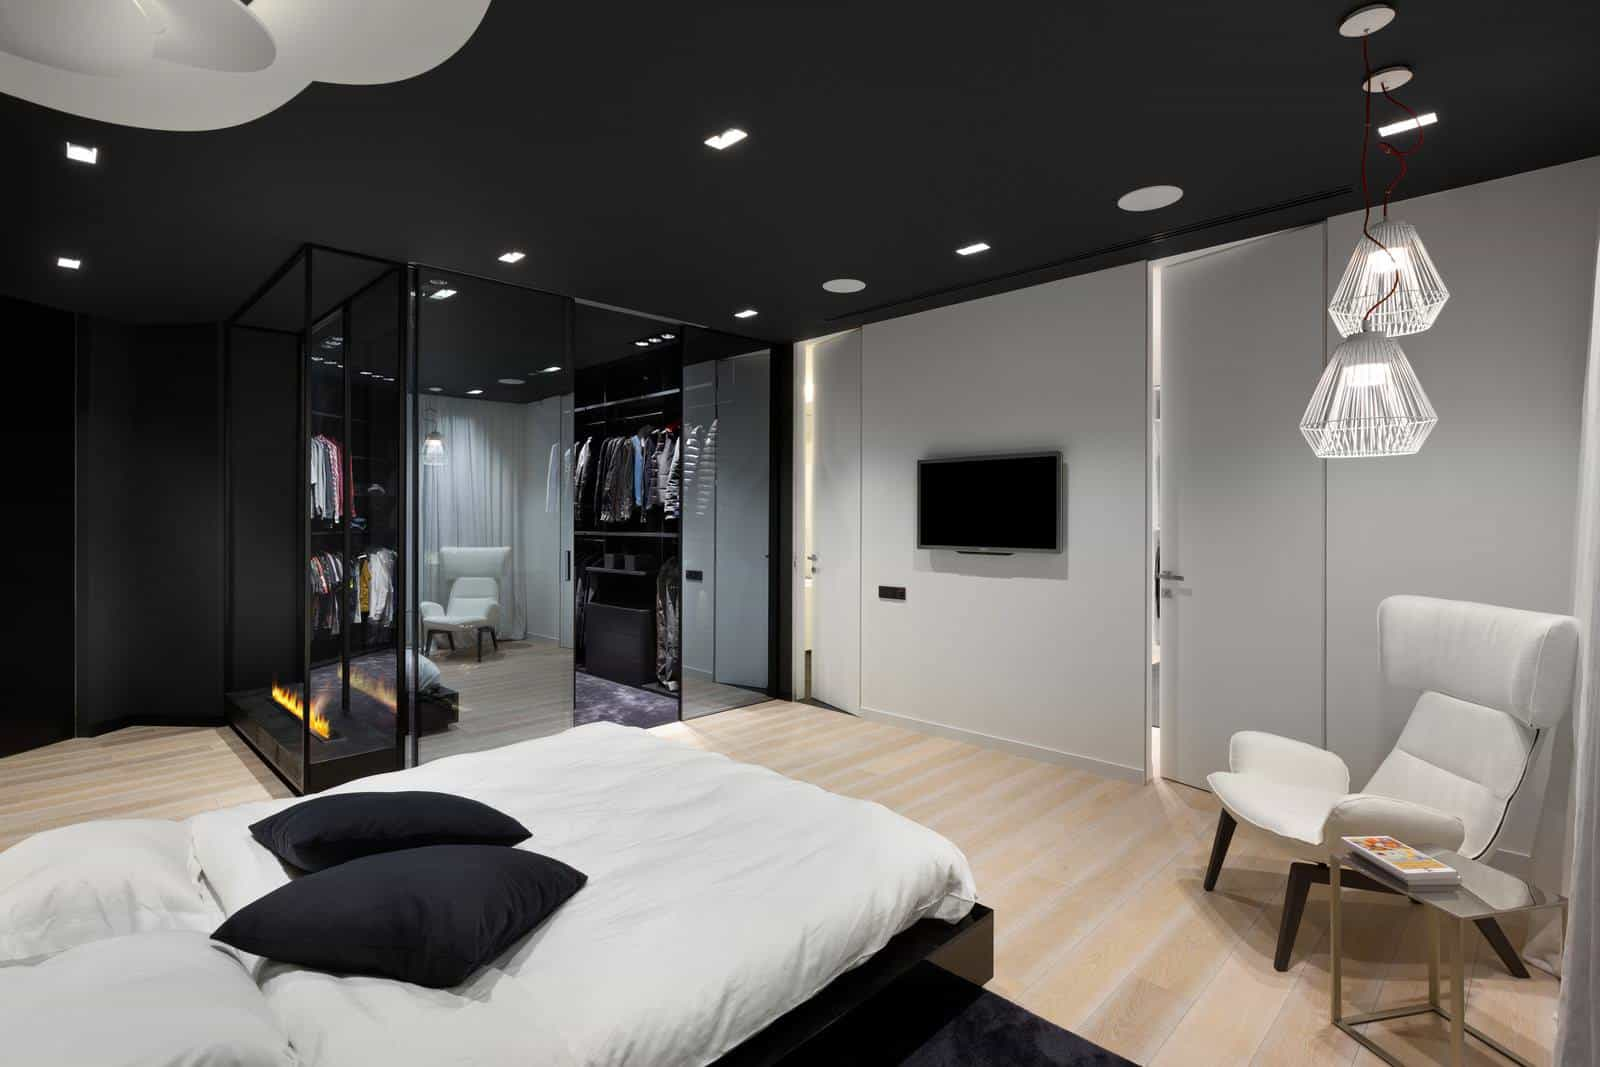 thiet-ke-noi-that-chung-cu-mai-dich-16 Thiết kế nội thất chung cư Mai Dịch - A. Sinh